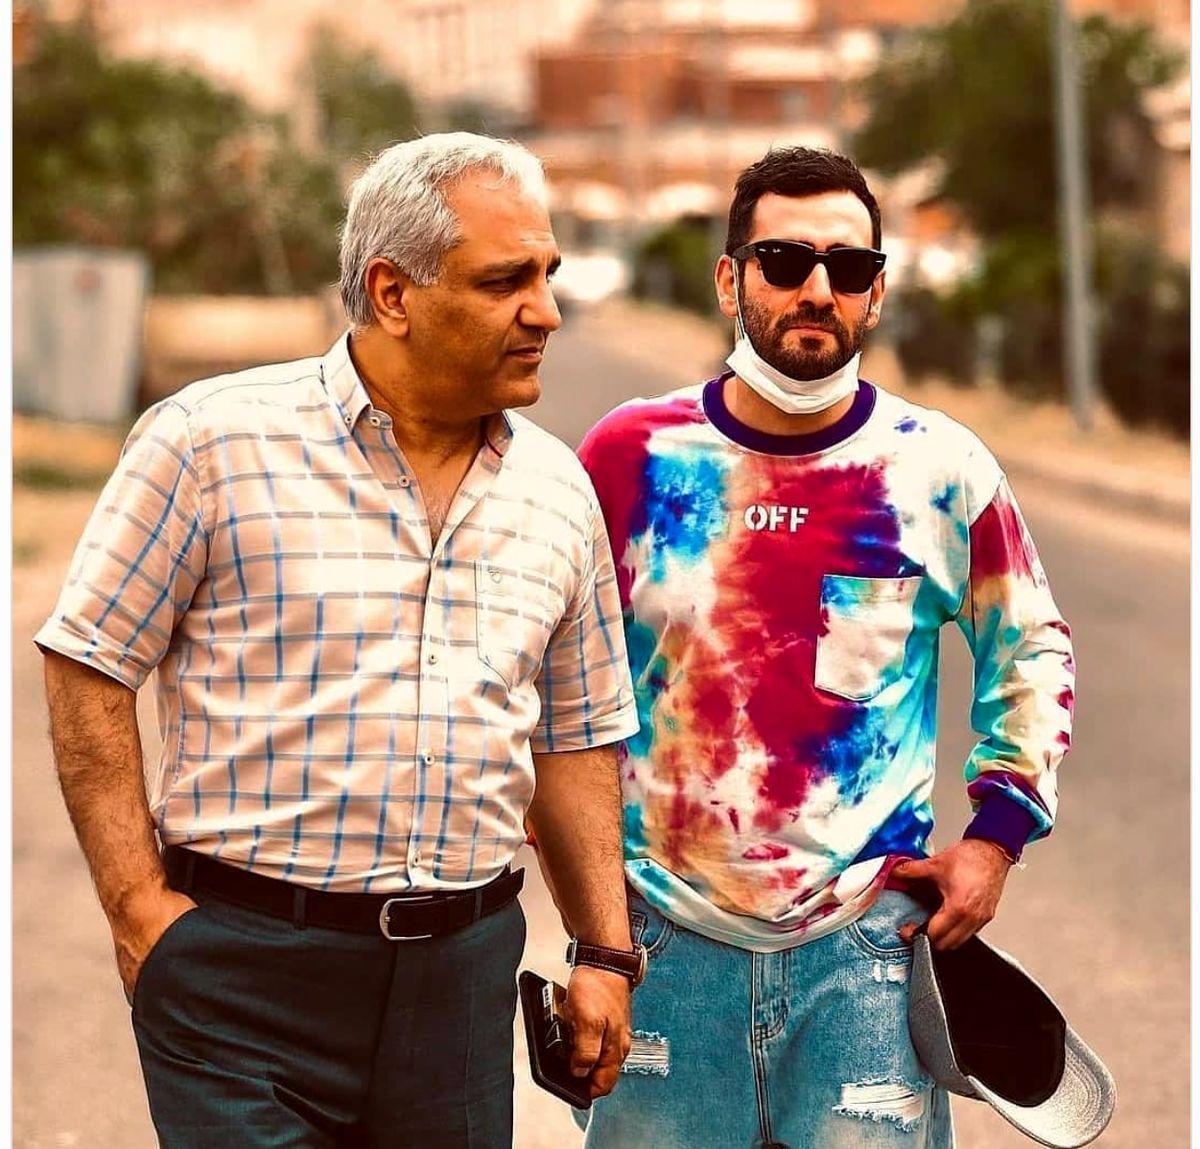 تیپِ خفن مهران مدیری و پسرش + عکس